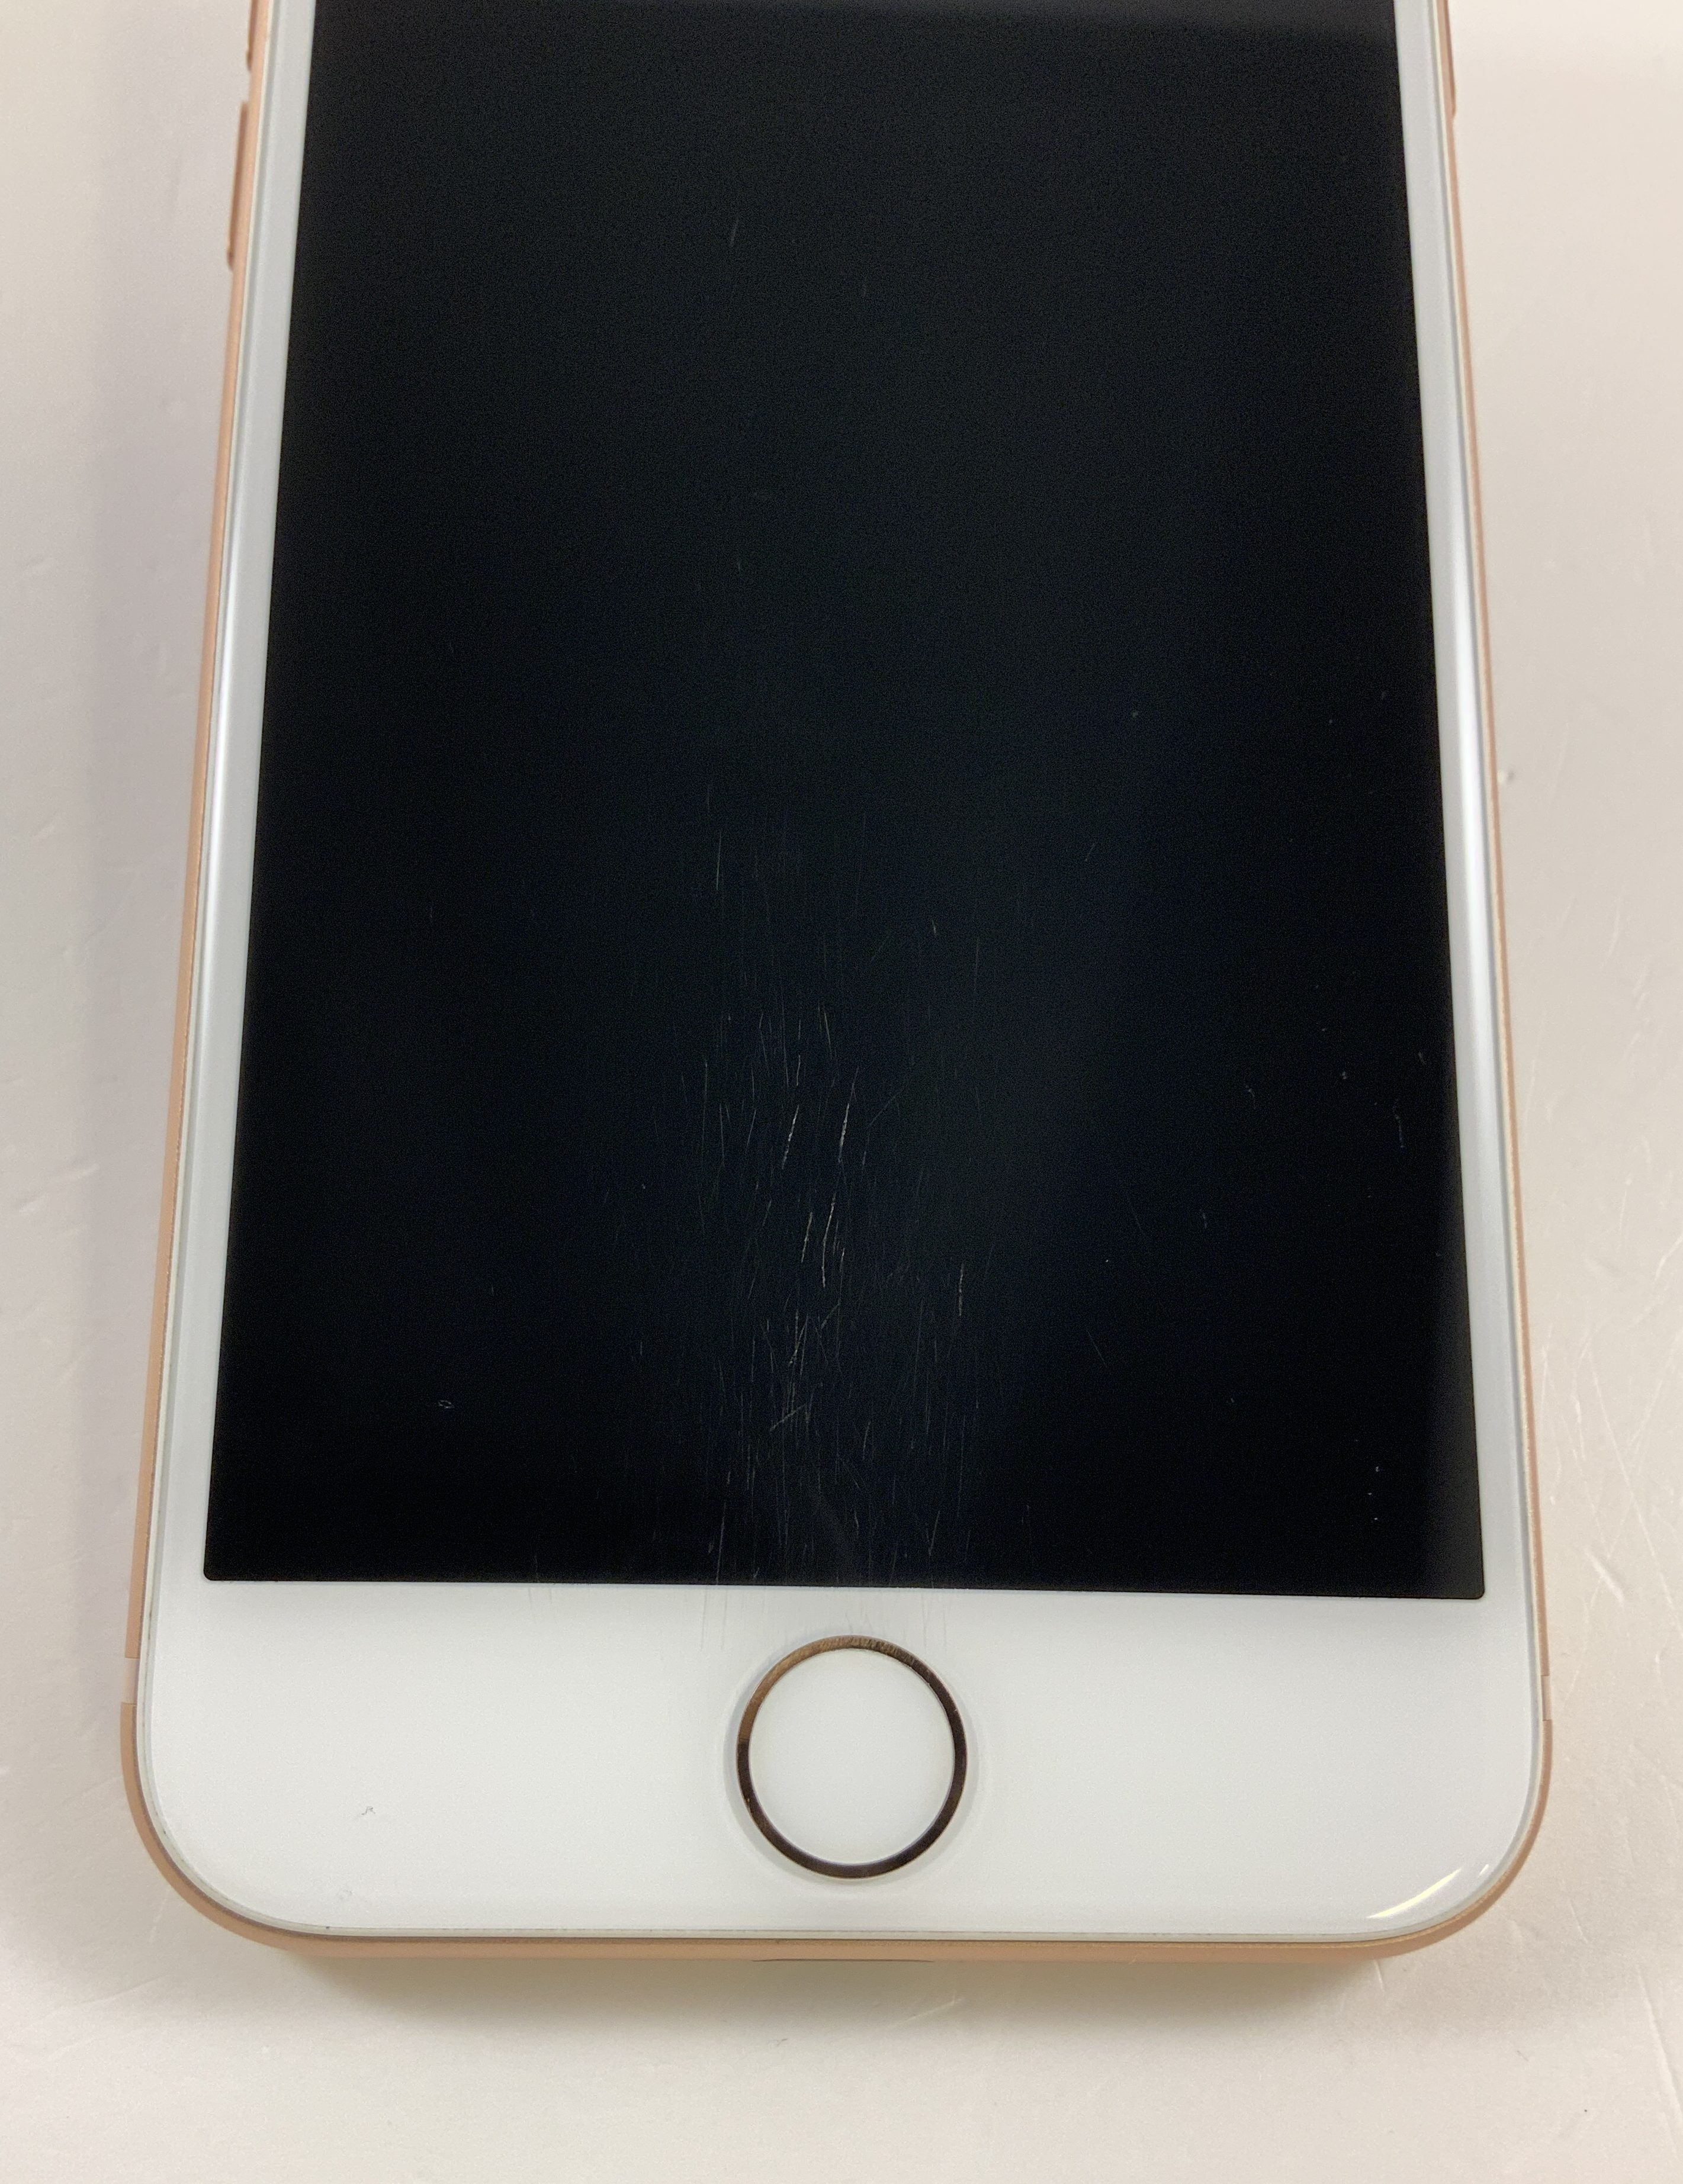 iPhone 8 64GB, 64GB, Gold, Afbeelding 3